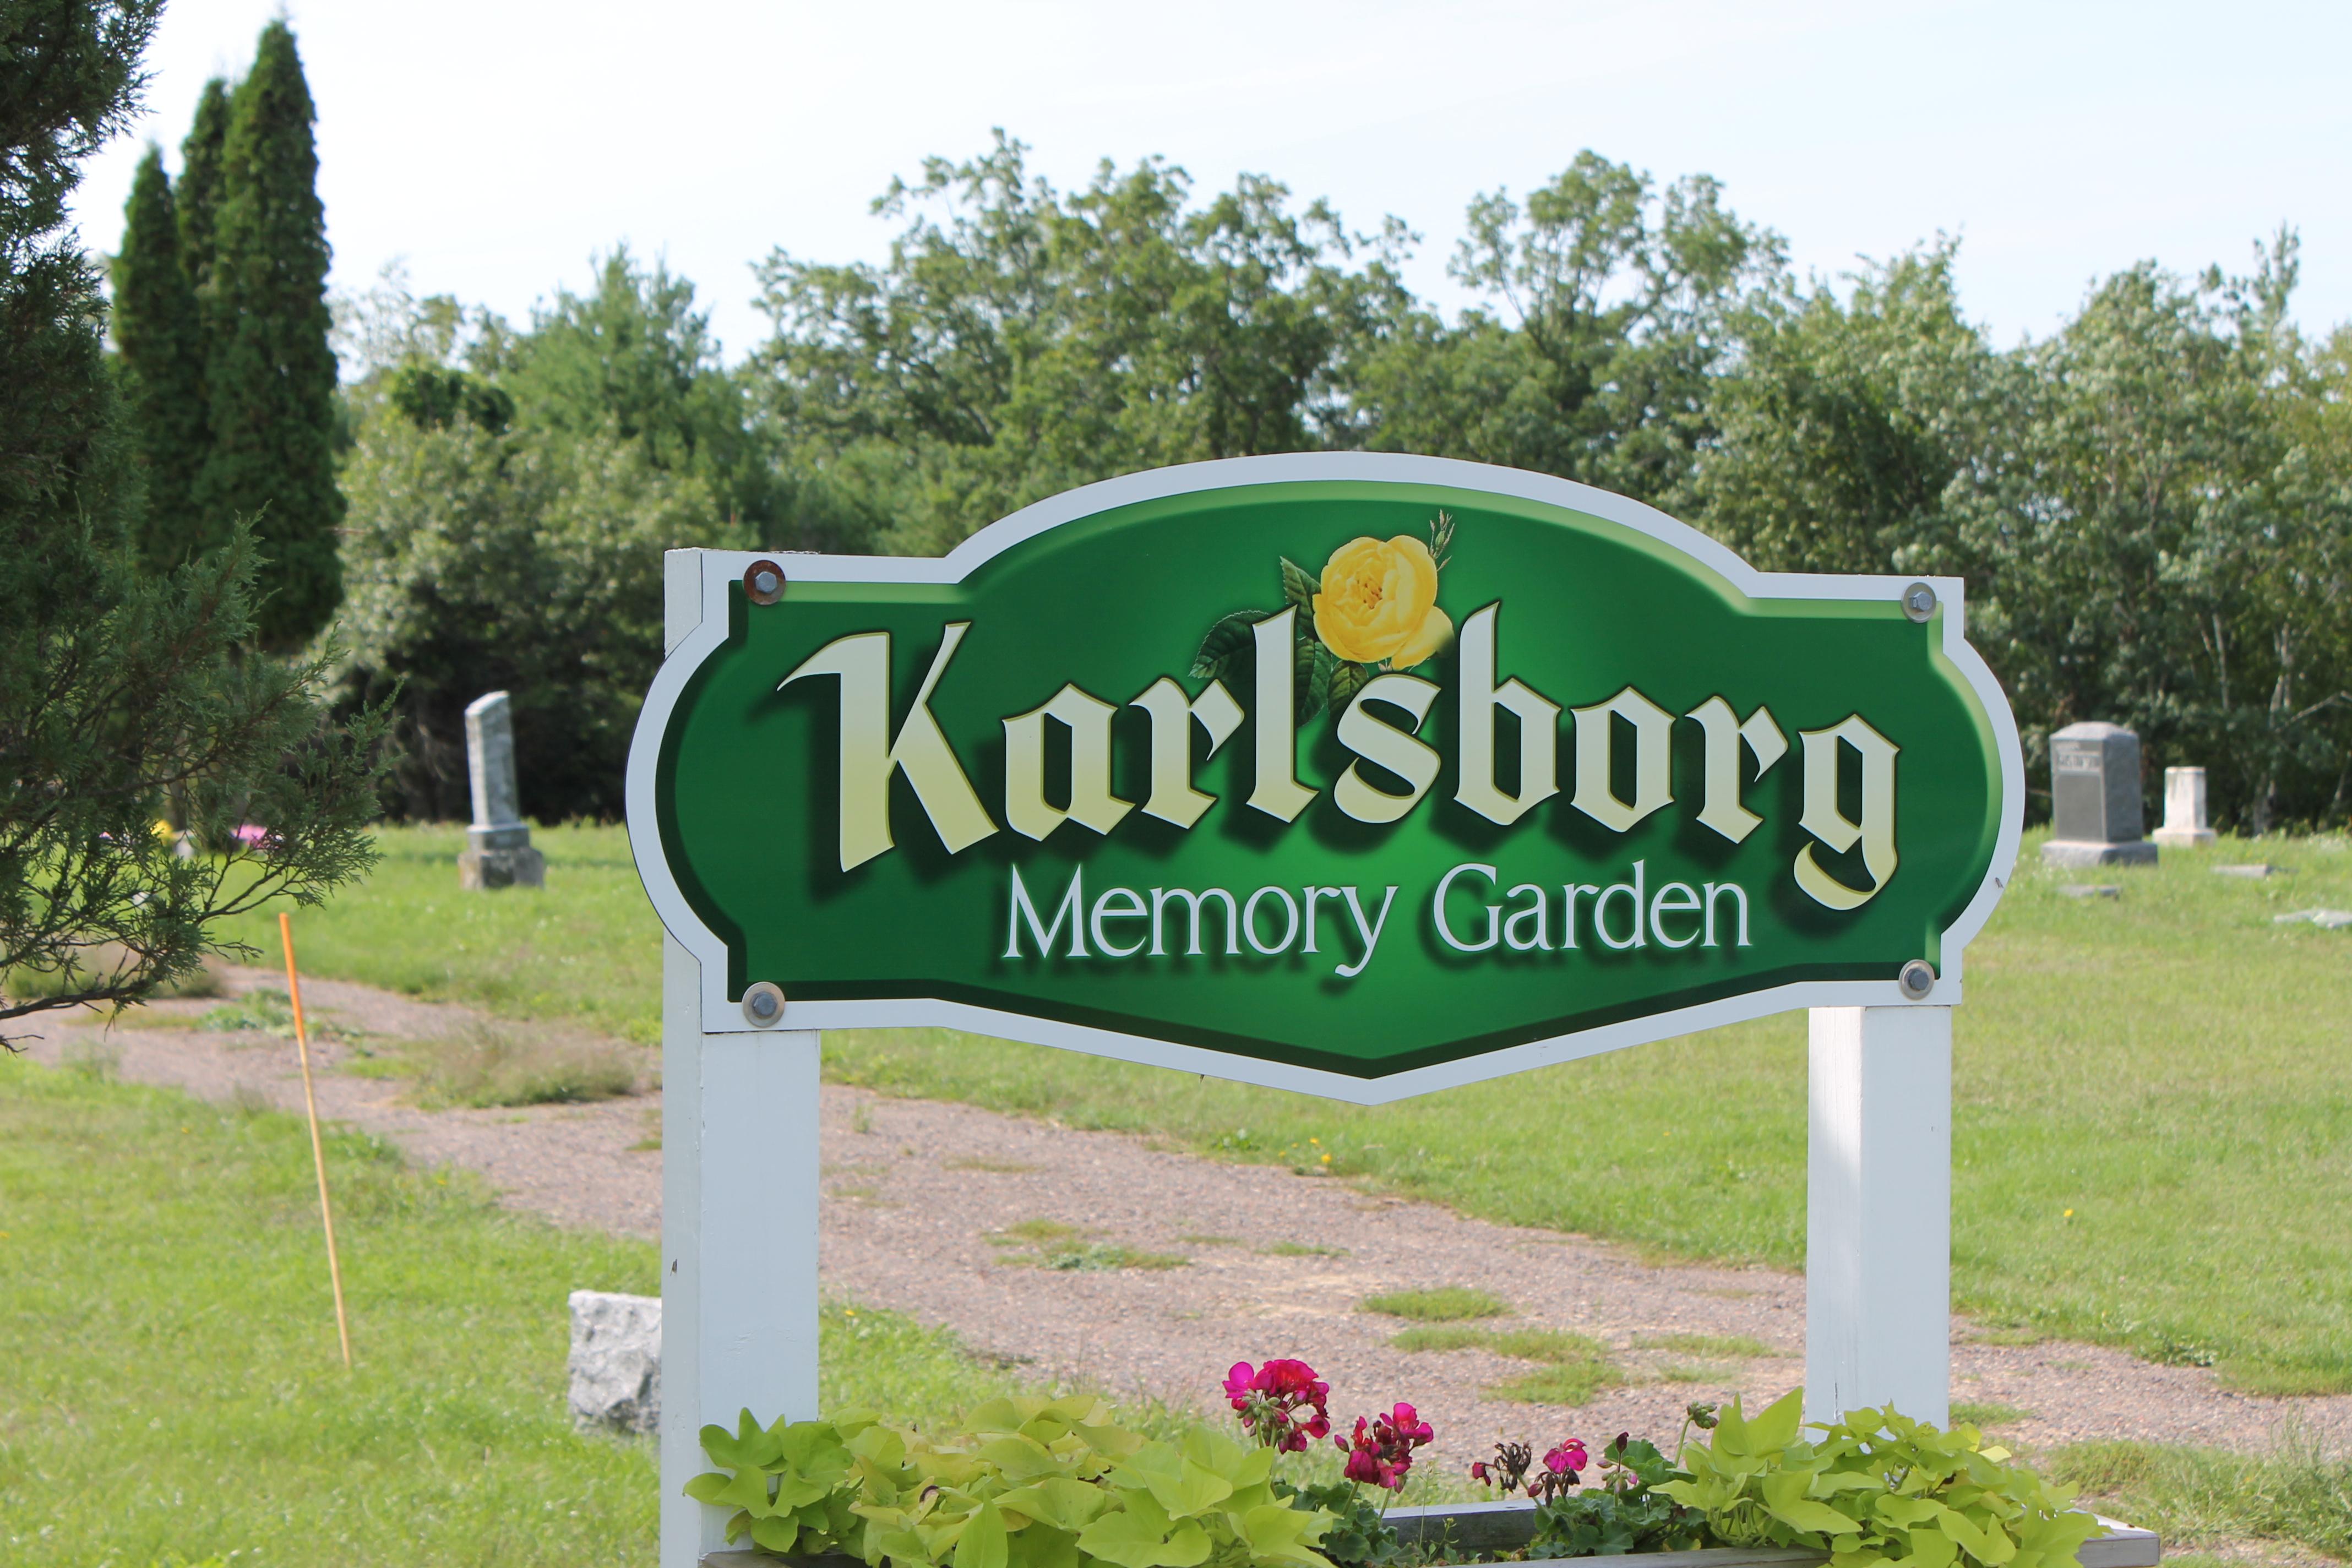 Karlsborg Cemetery